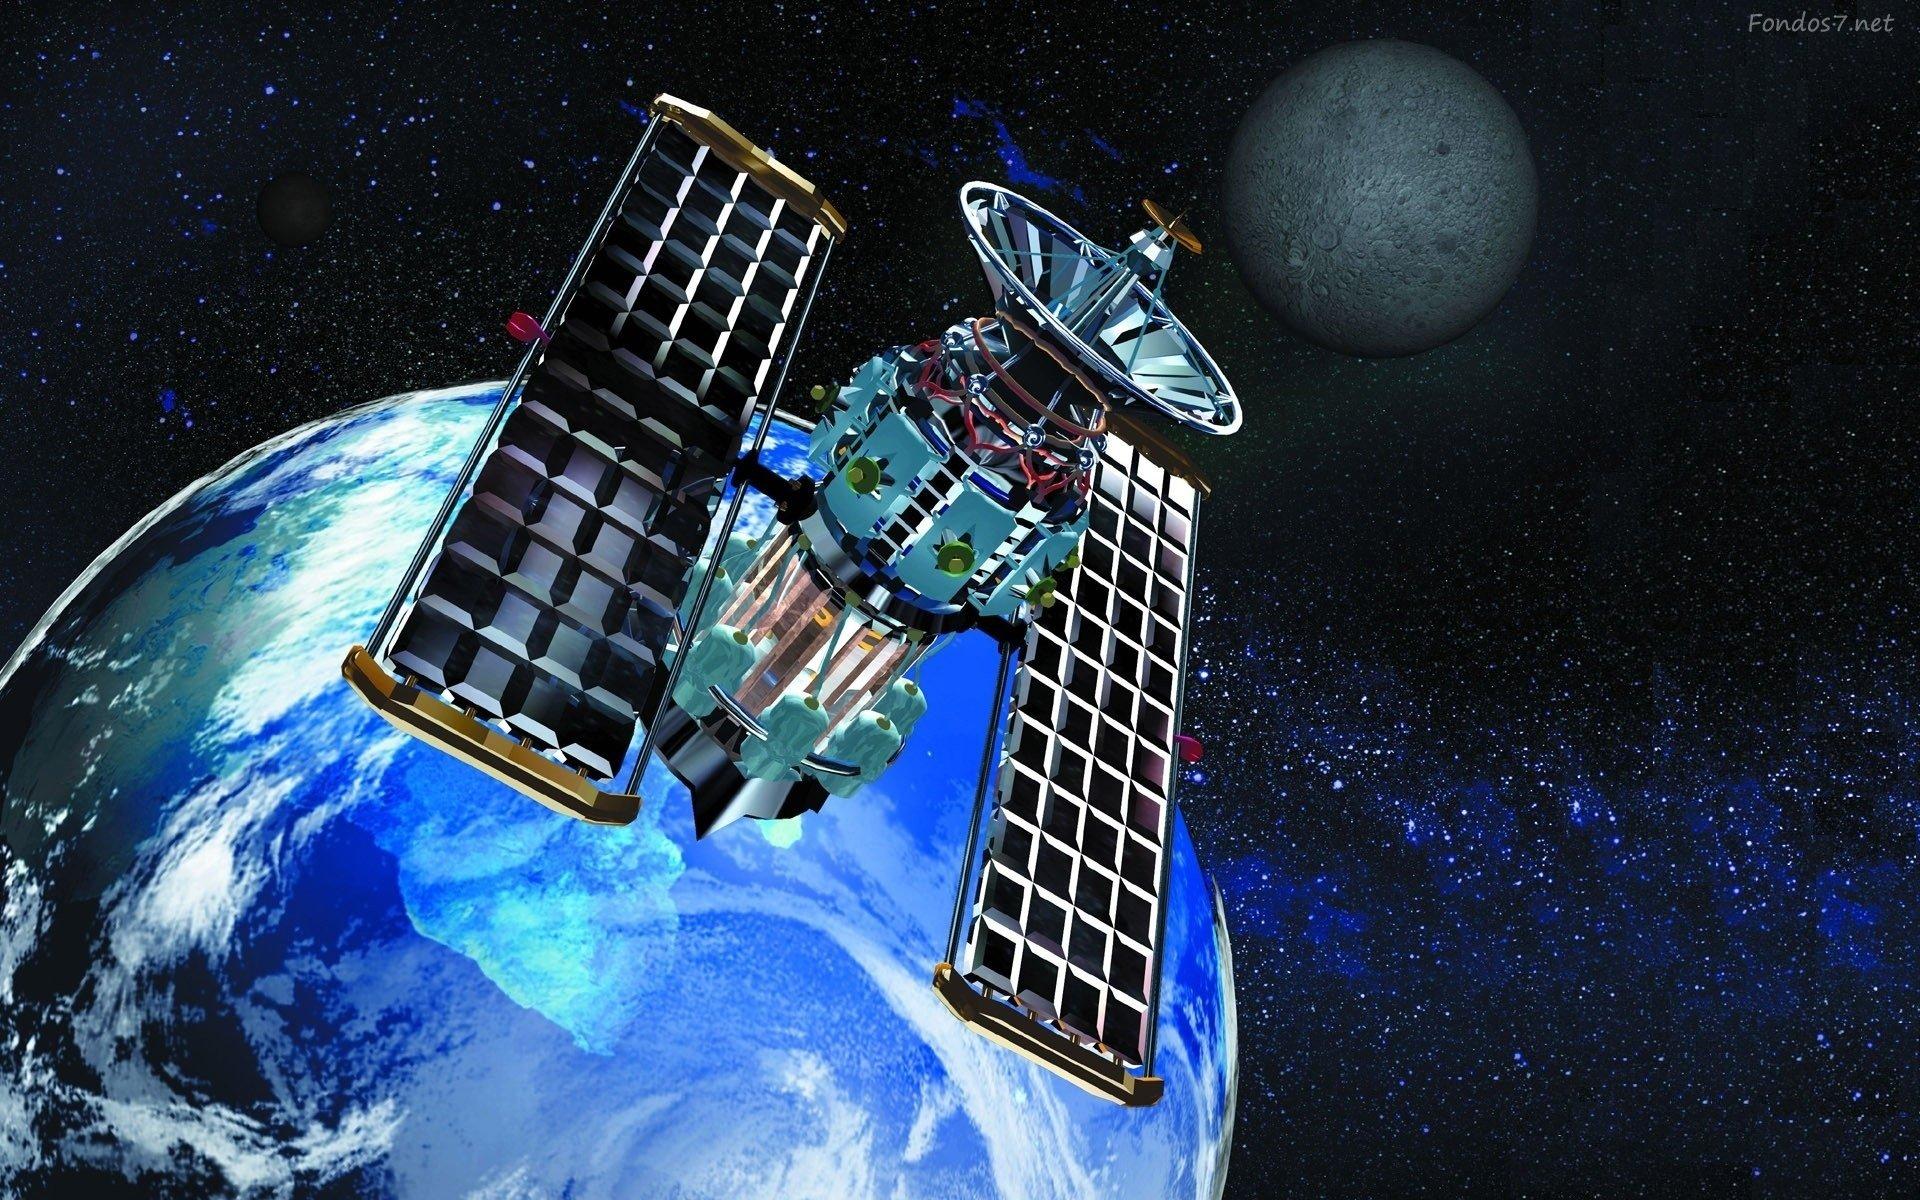 http://www.vladtime.ru/uploads/posts/2017-05/1495020922_sat-lites-descargar-fondos-de-pantalla-satelite-espacial-hd-widescreen-gratis-1519957.jpg